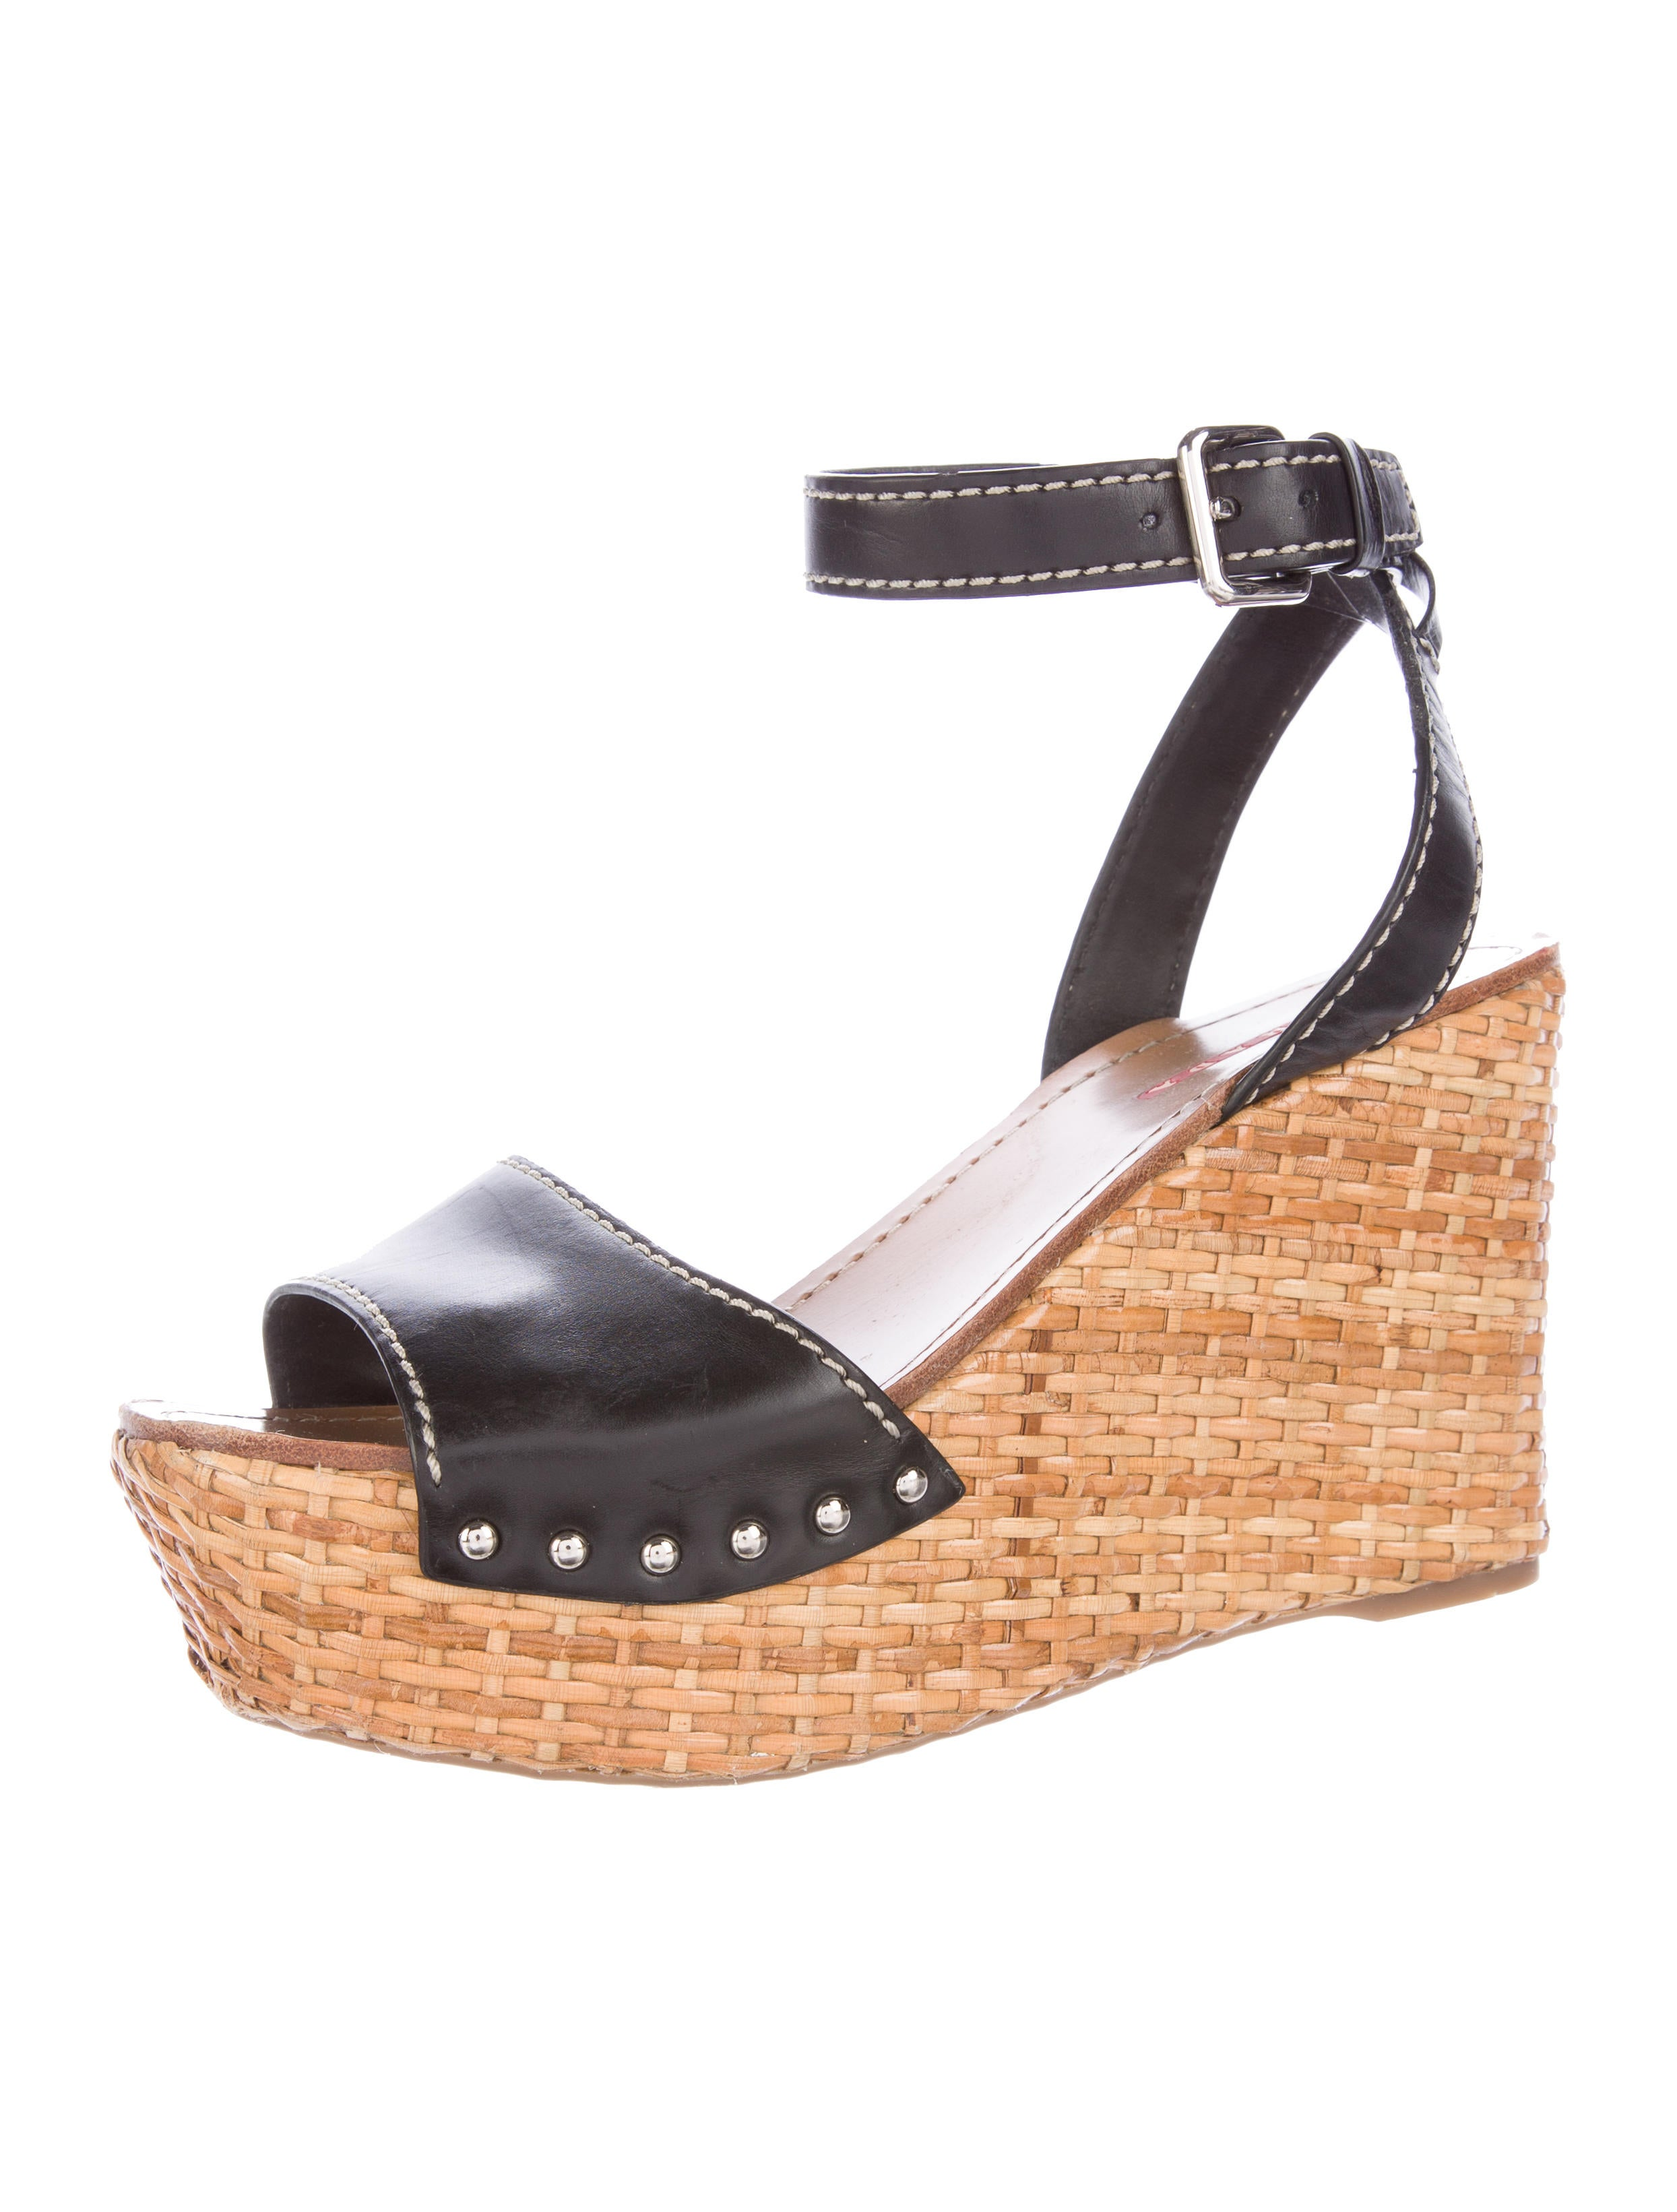 prada sport platform wedge sandals shoes wpr40220